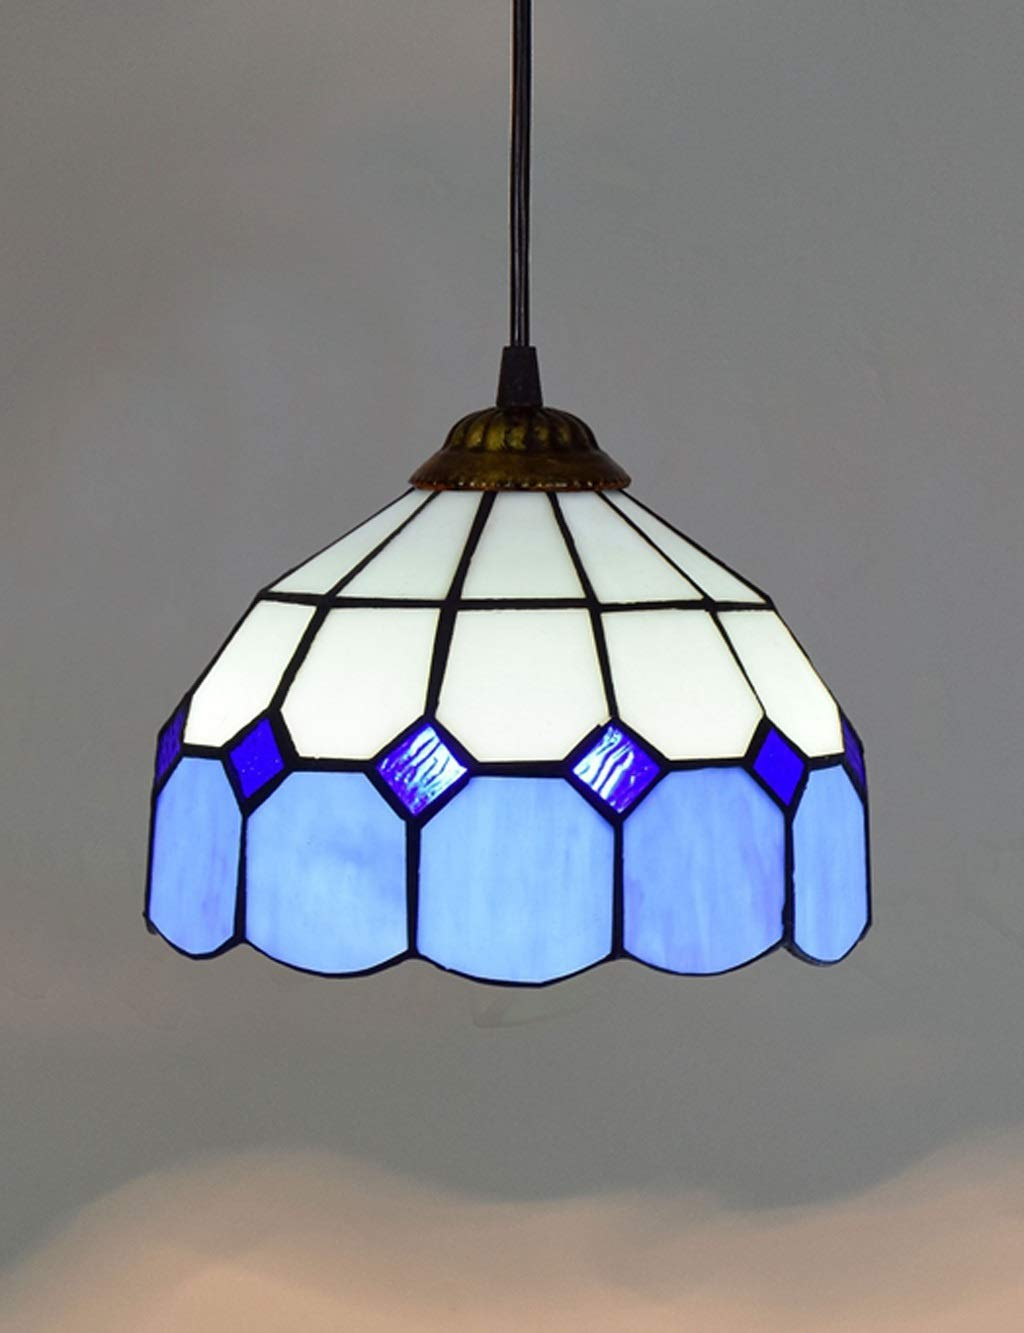 Kronleuchter, Glaslampen, Bar Restaurant Kronleuchter